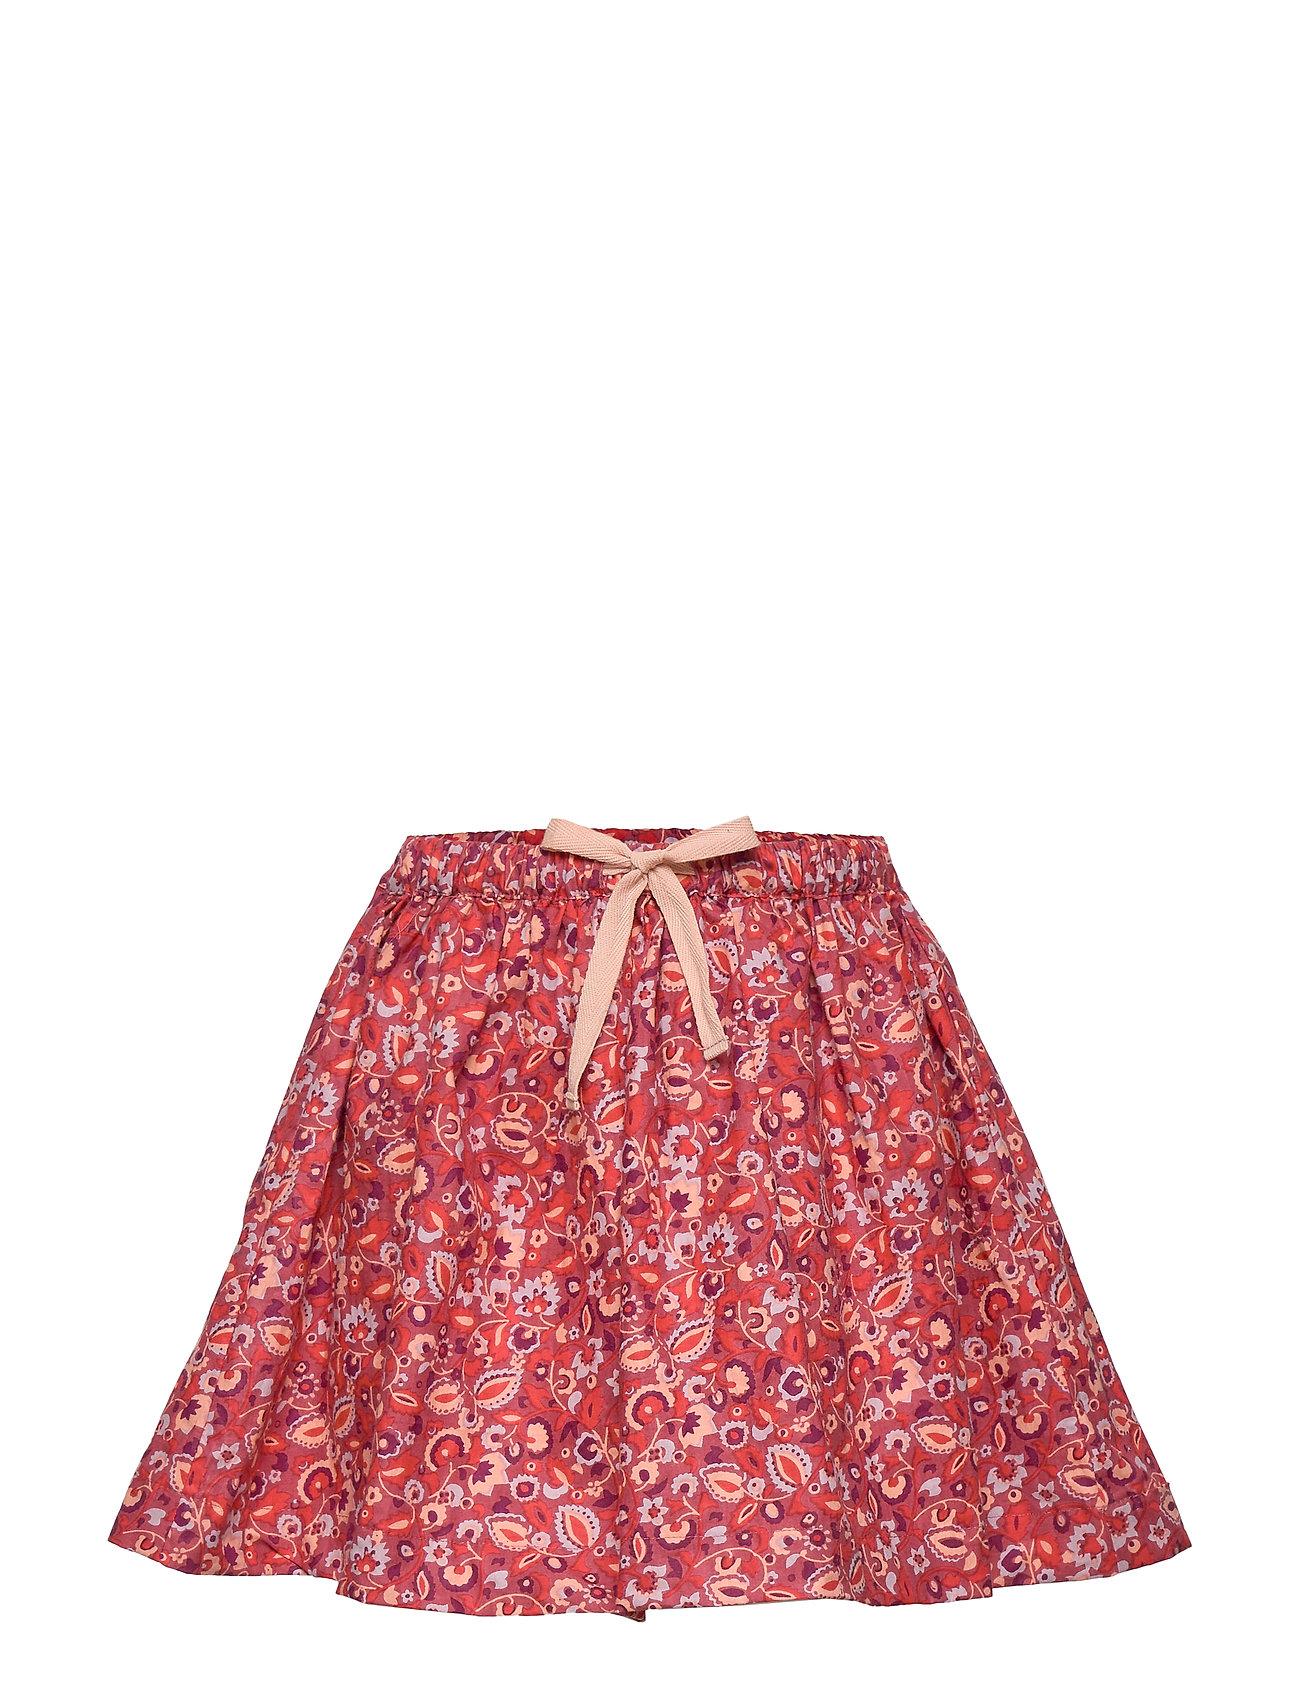 Noa Noa Miniature Skirt - BAROQUE ROSE